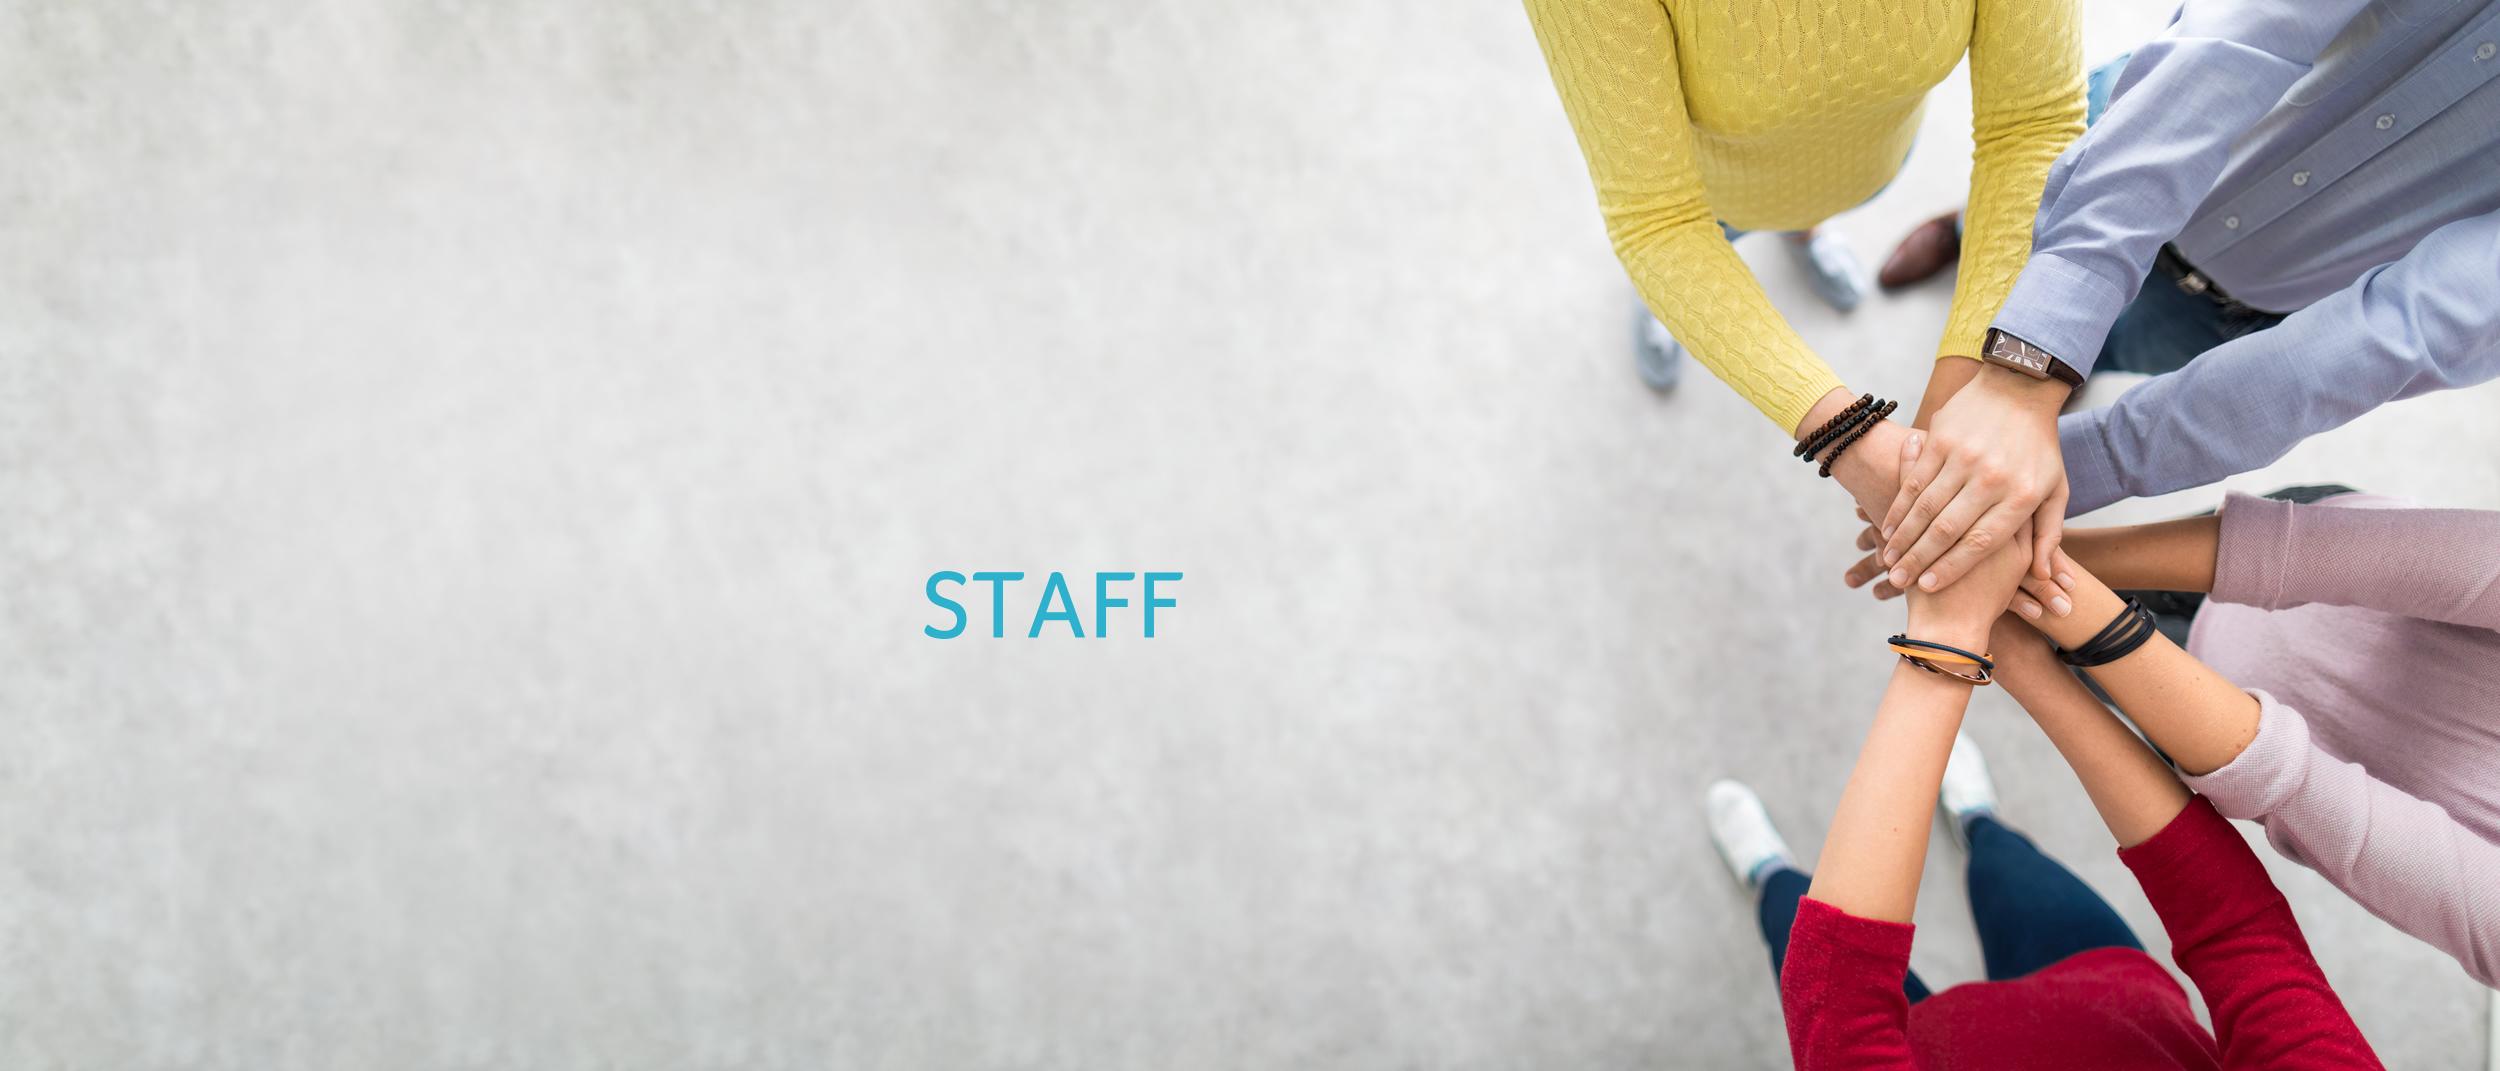 StaffTopiStock-882292568.jpg